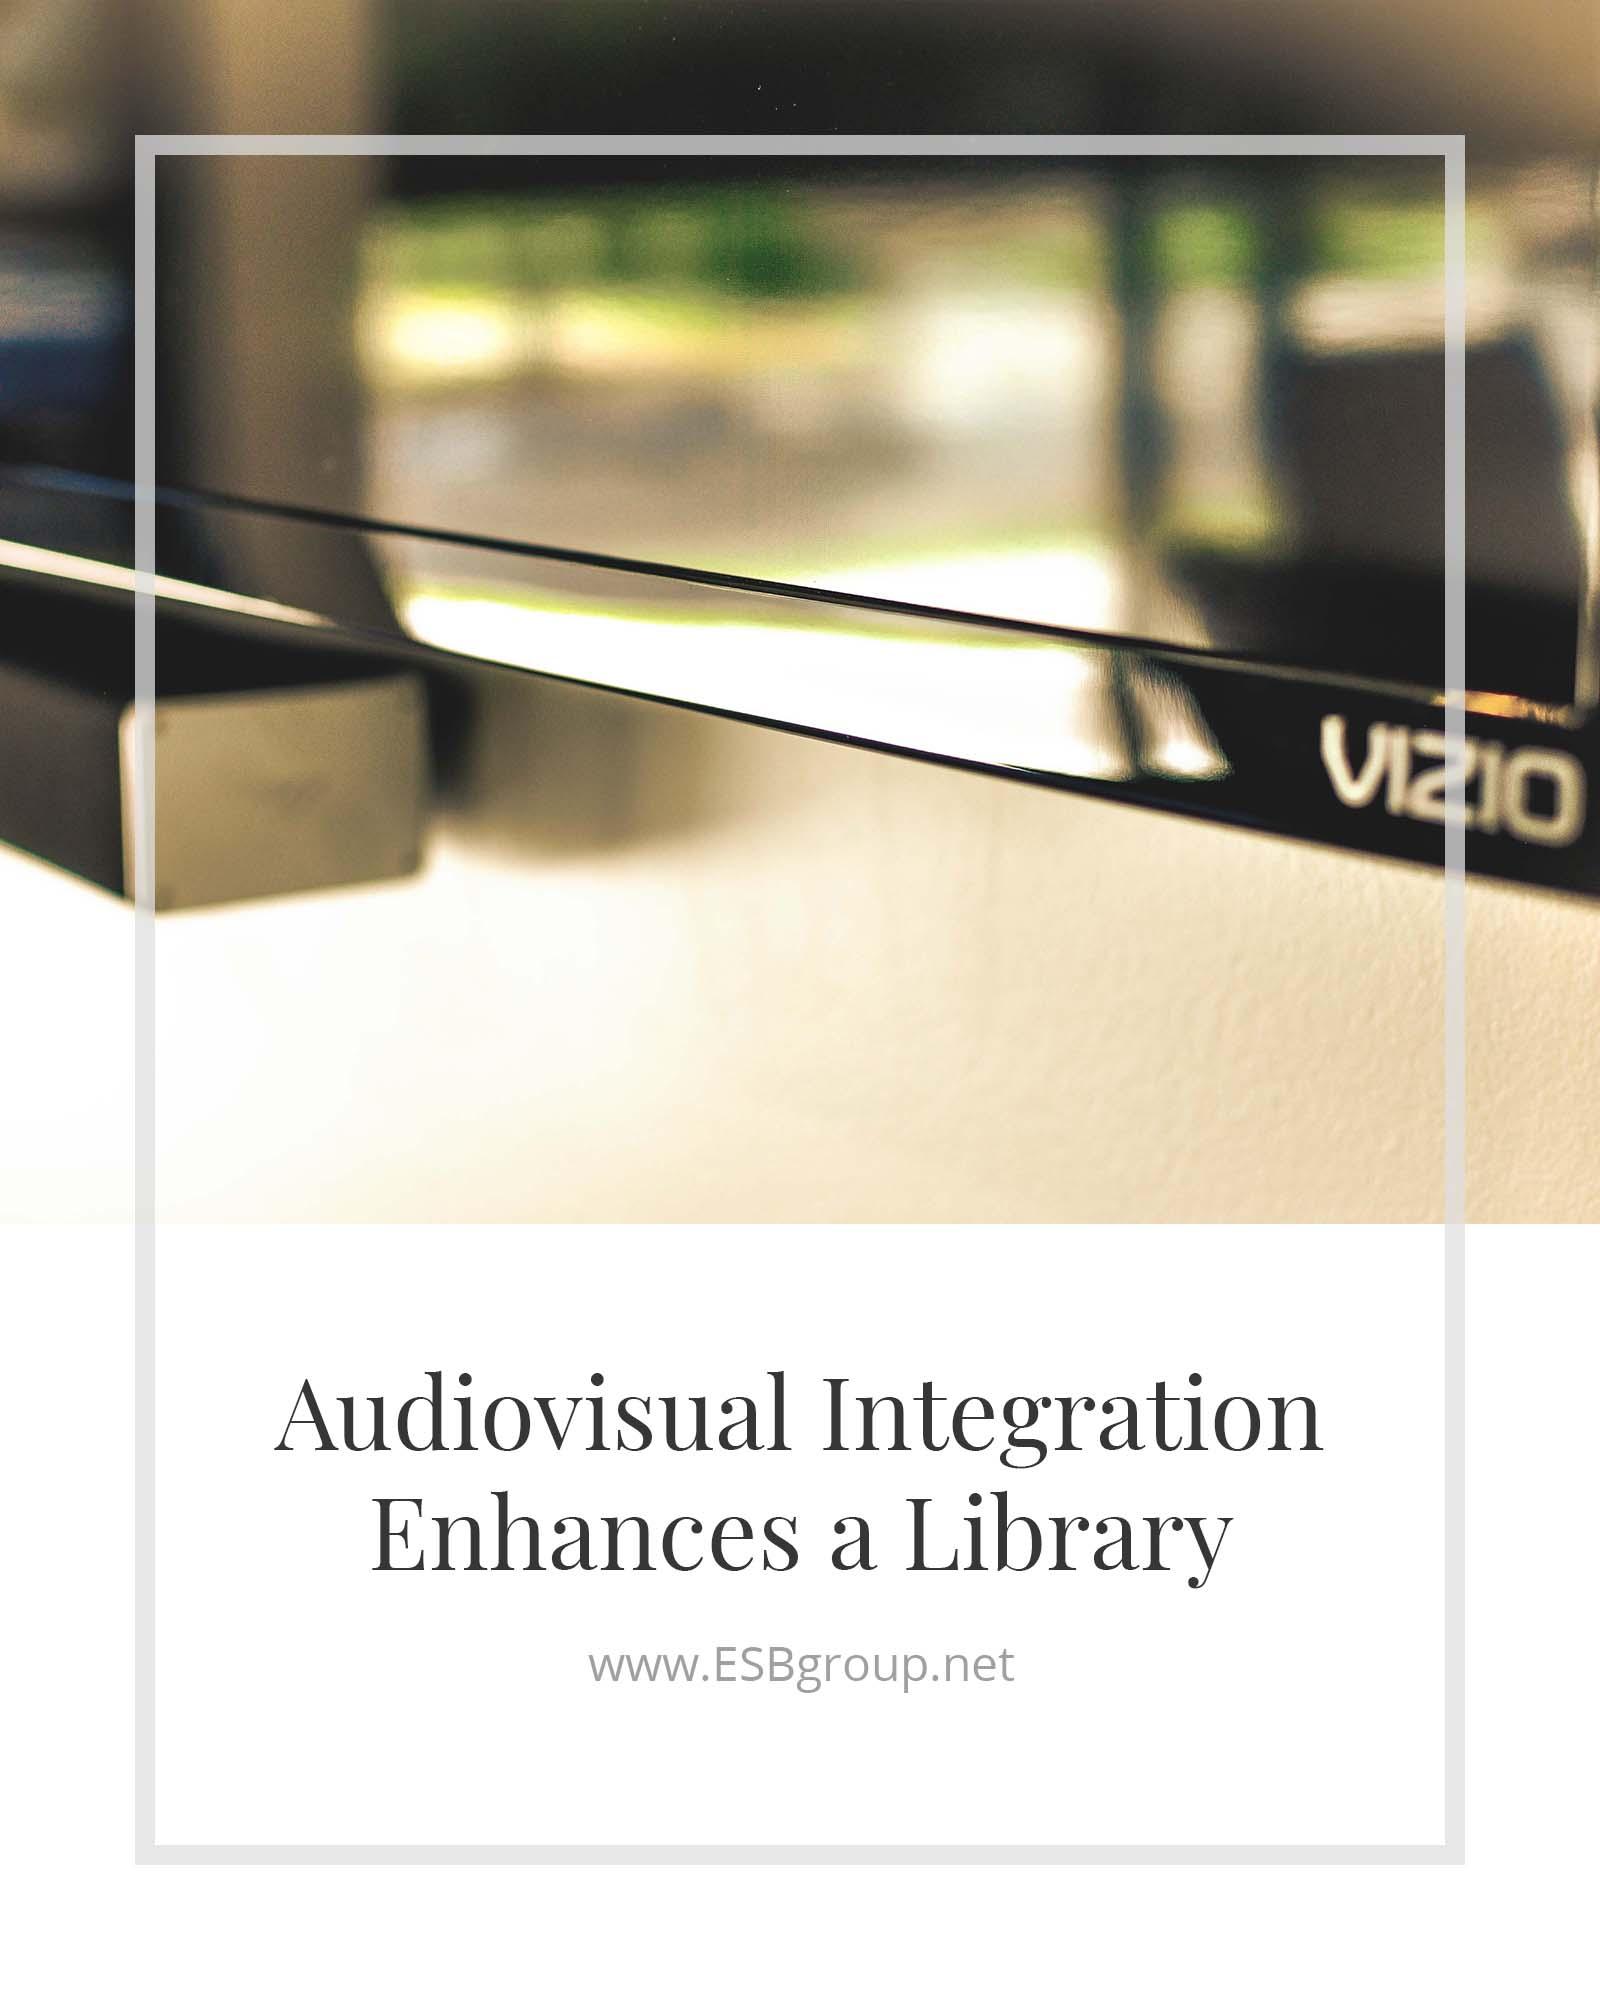 Audiovisual-Library-Alabama.jpg